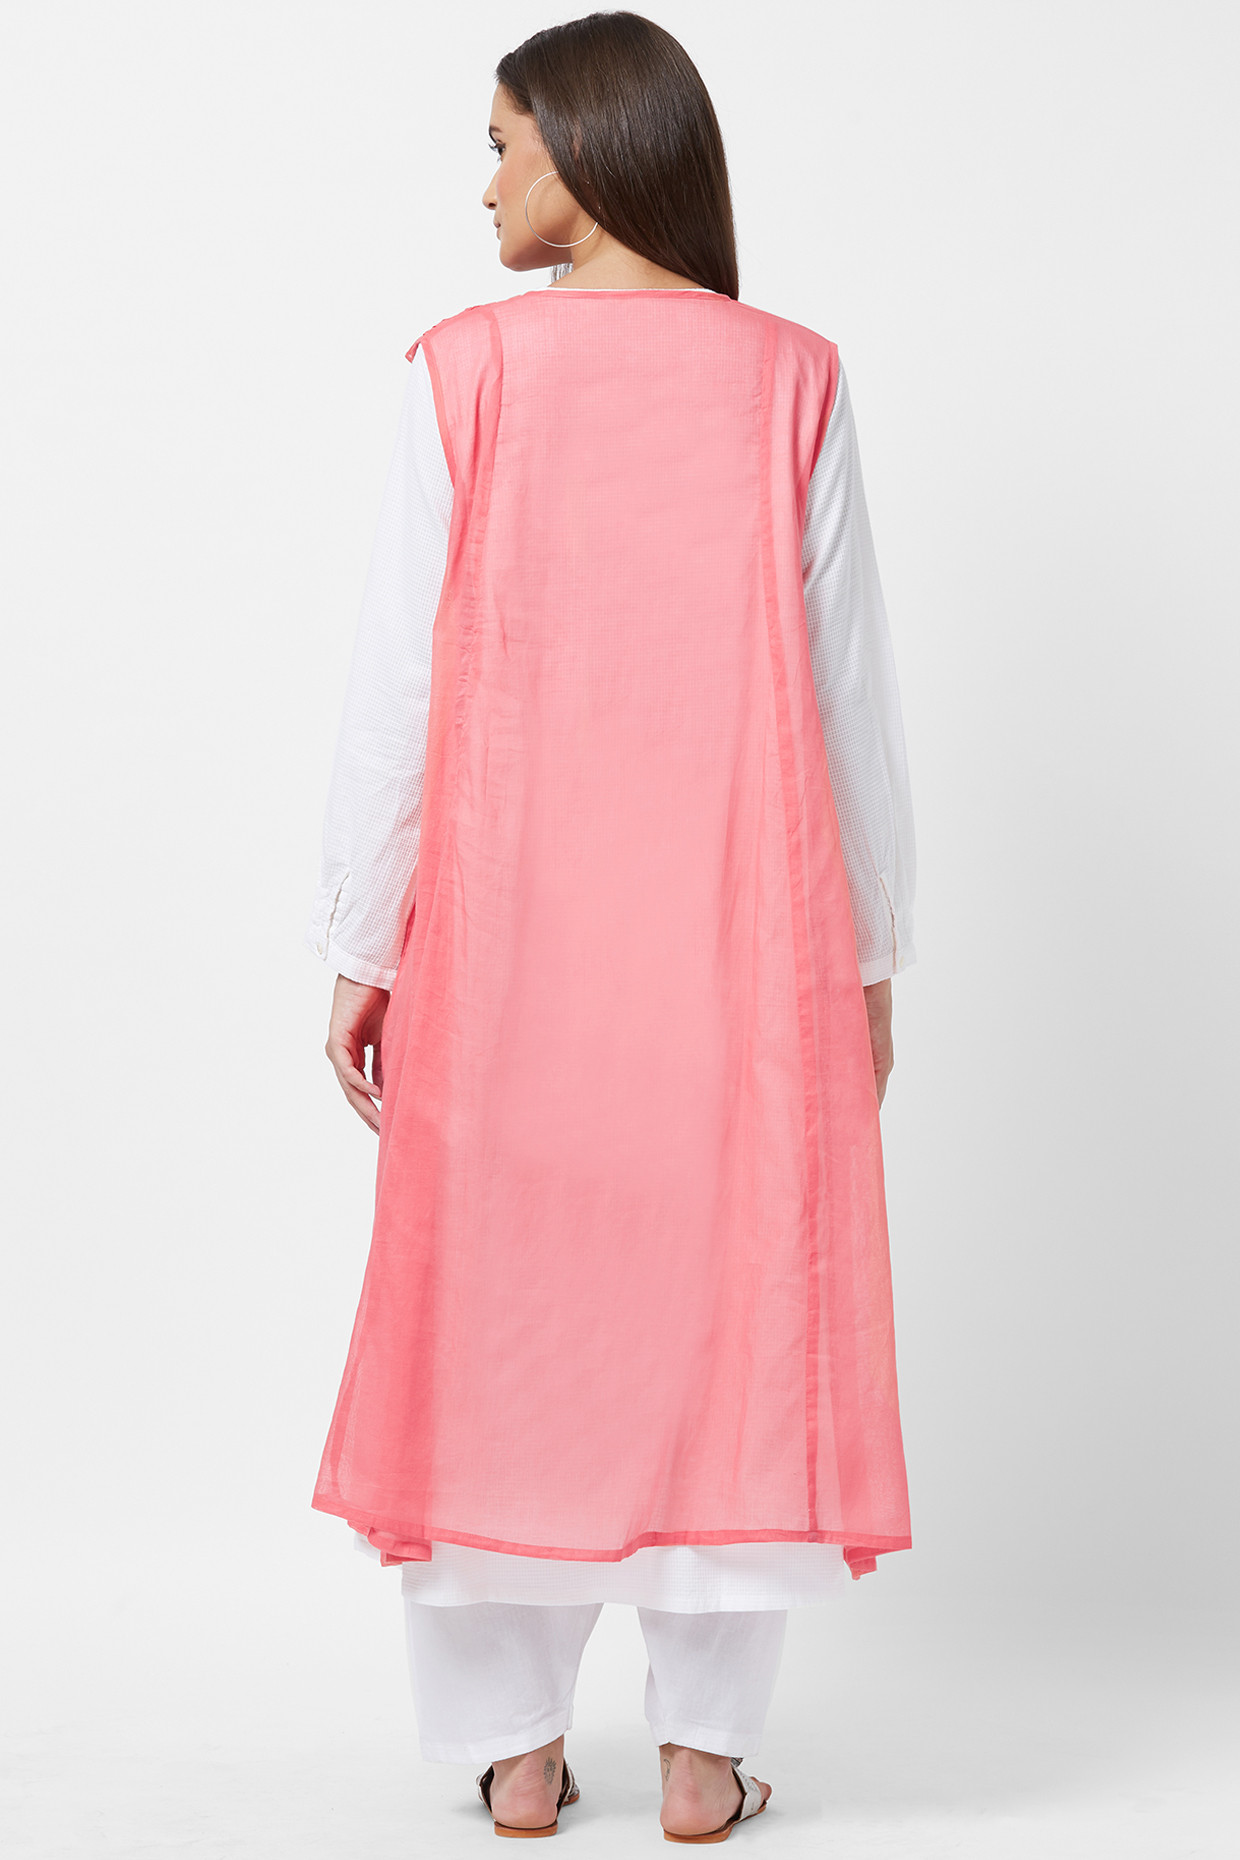 Cotton White Kurta With Red Sleeveless Slip Dress by House Of Idar